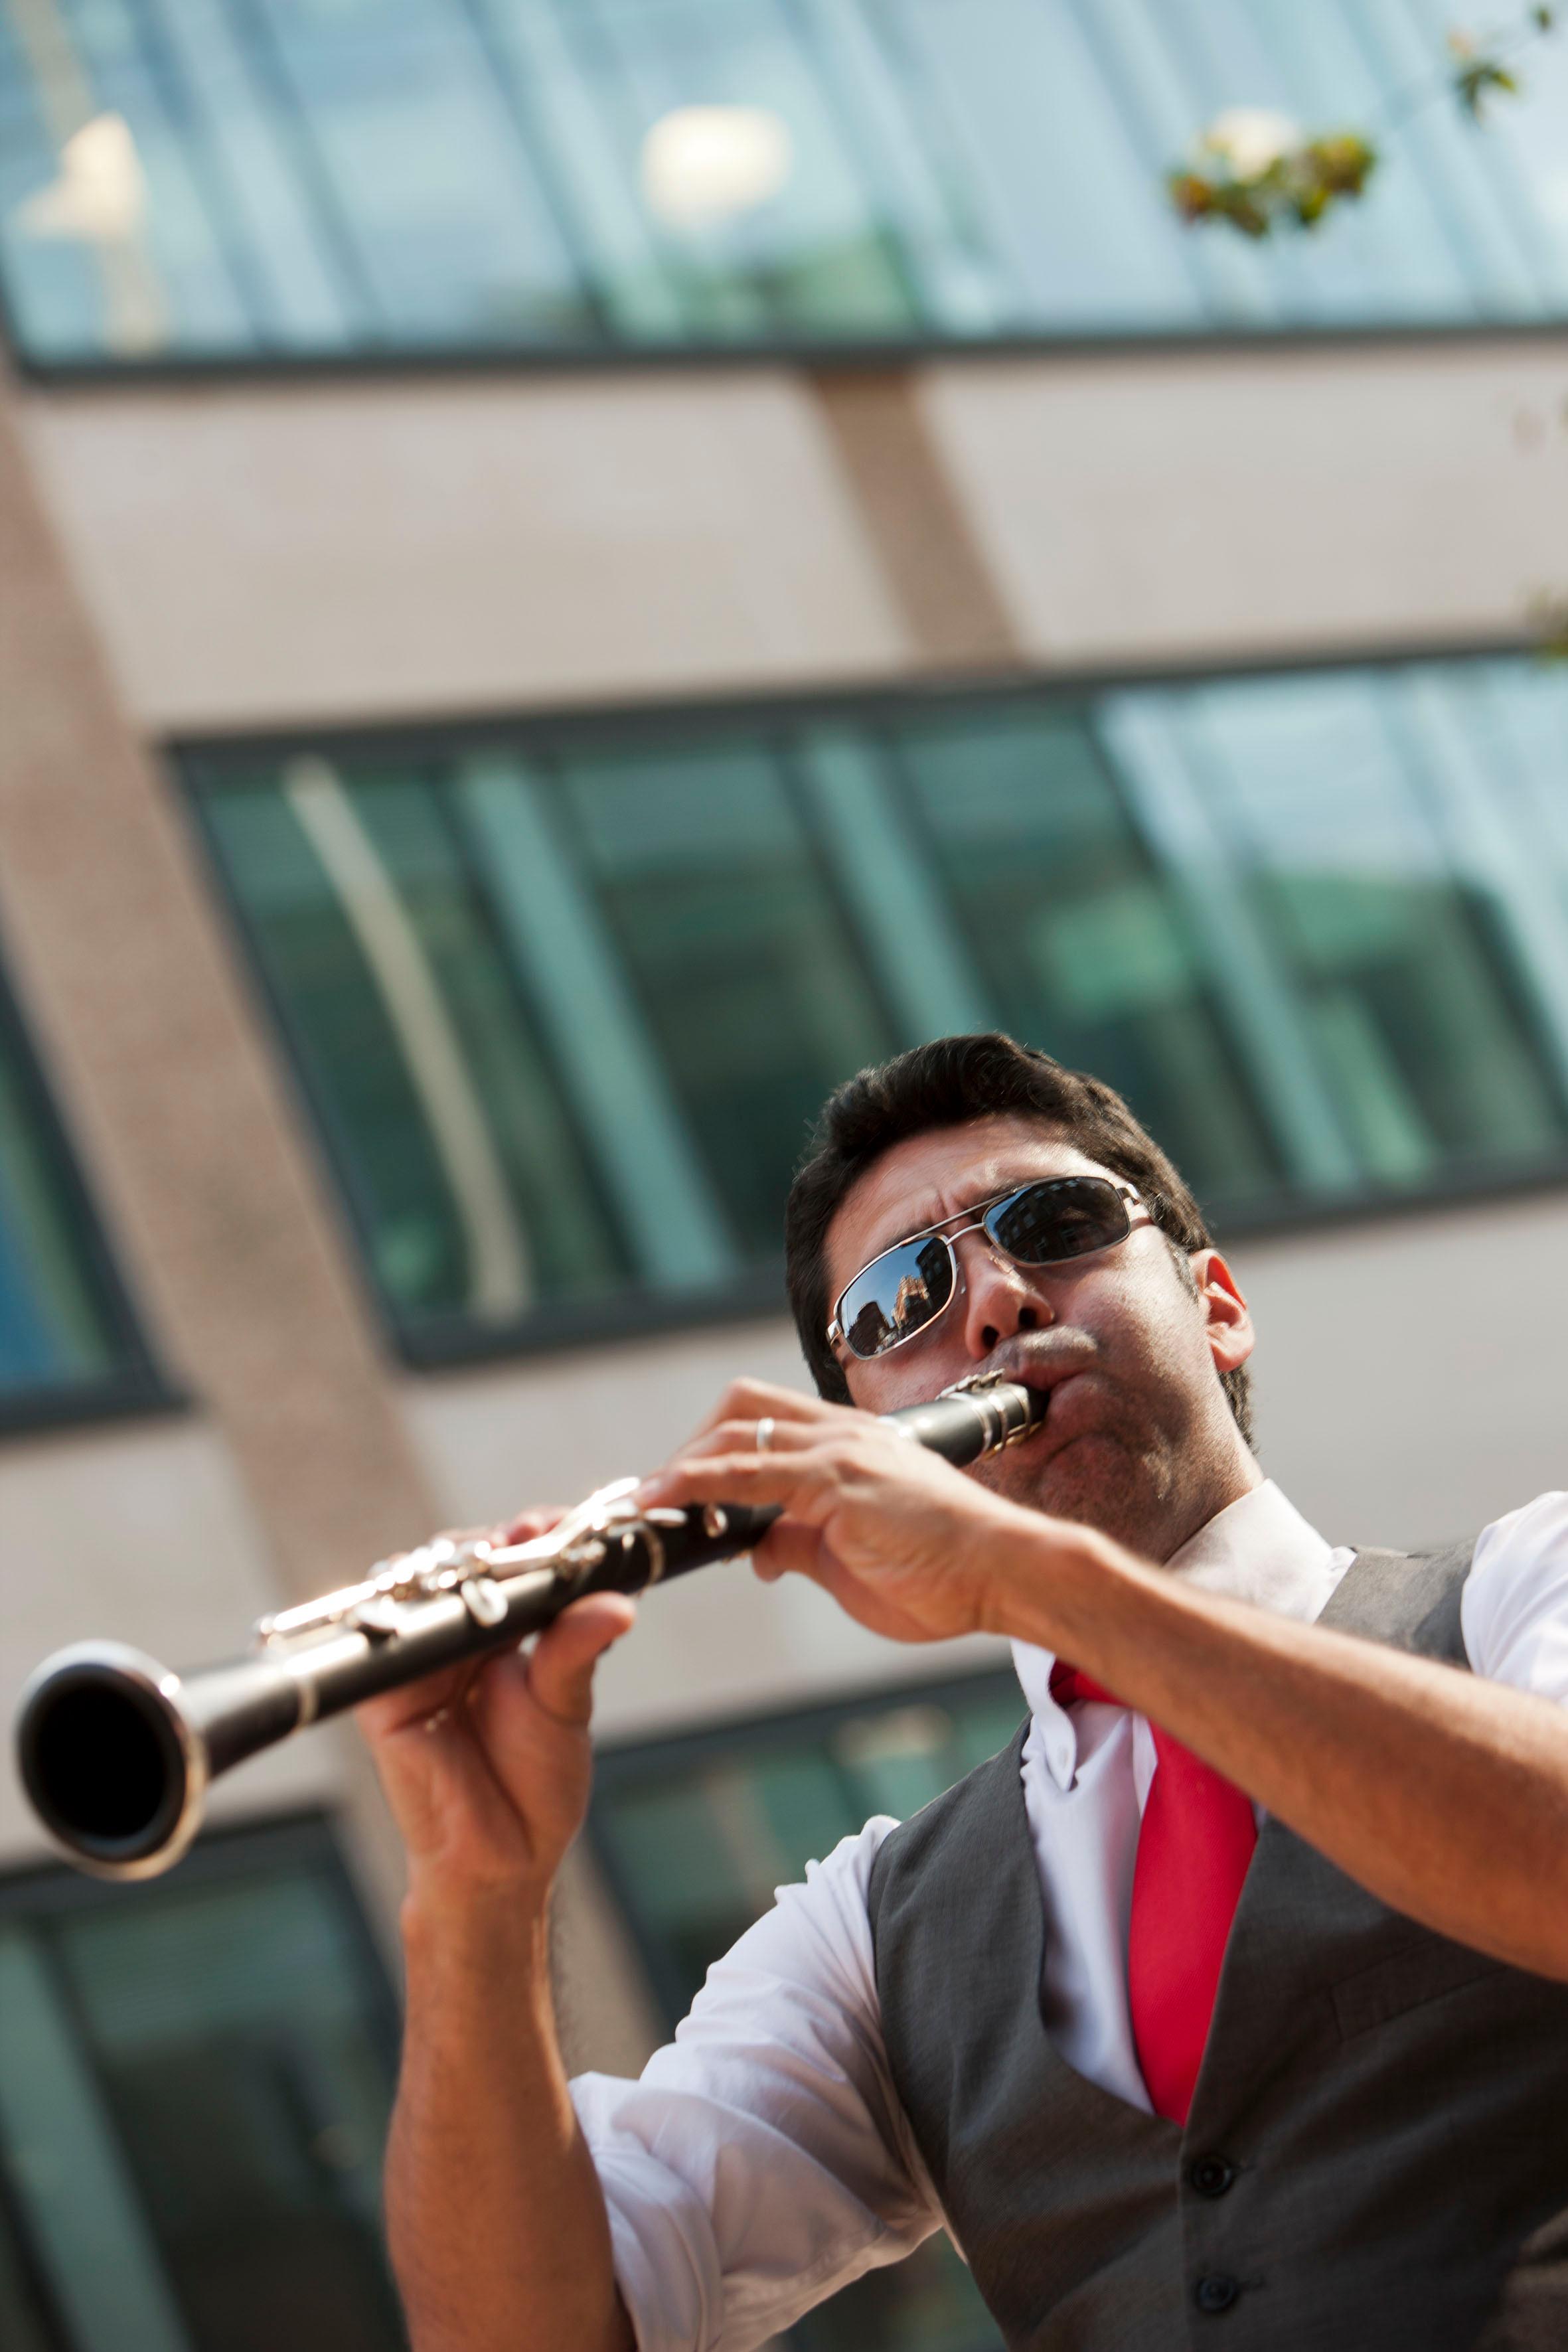 England, Birmingham, 08-07-13 The Potato Head Jazz band at church street sq. © Photo Merlin Daleman